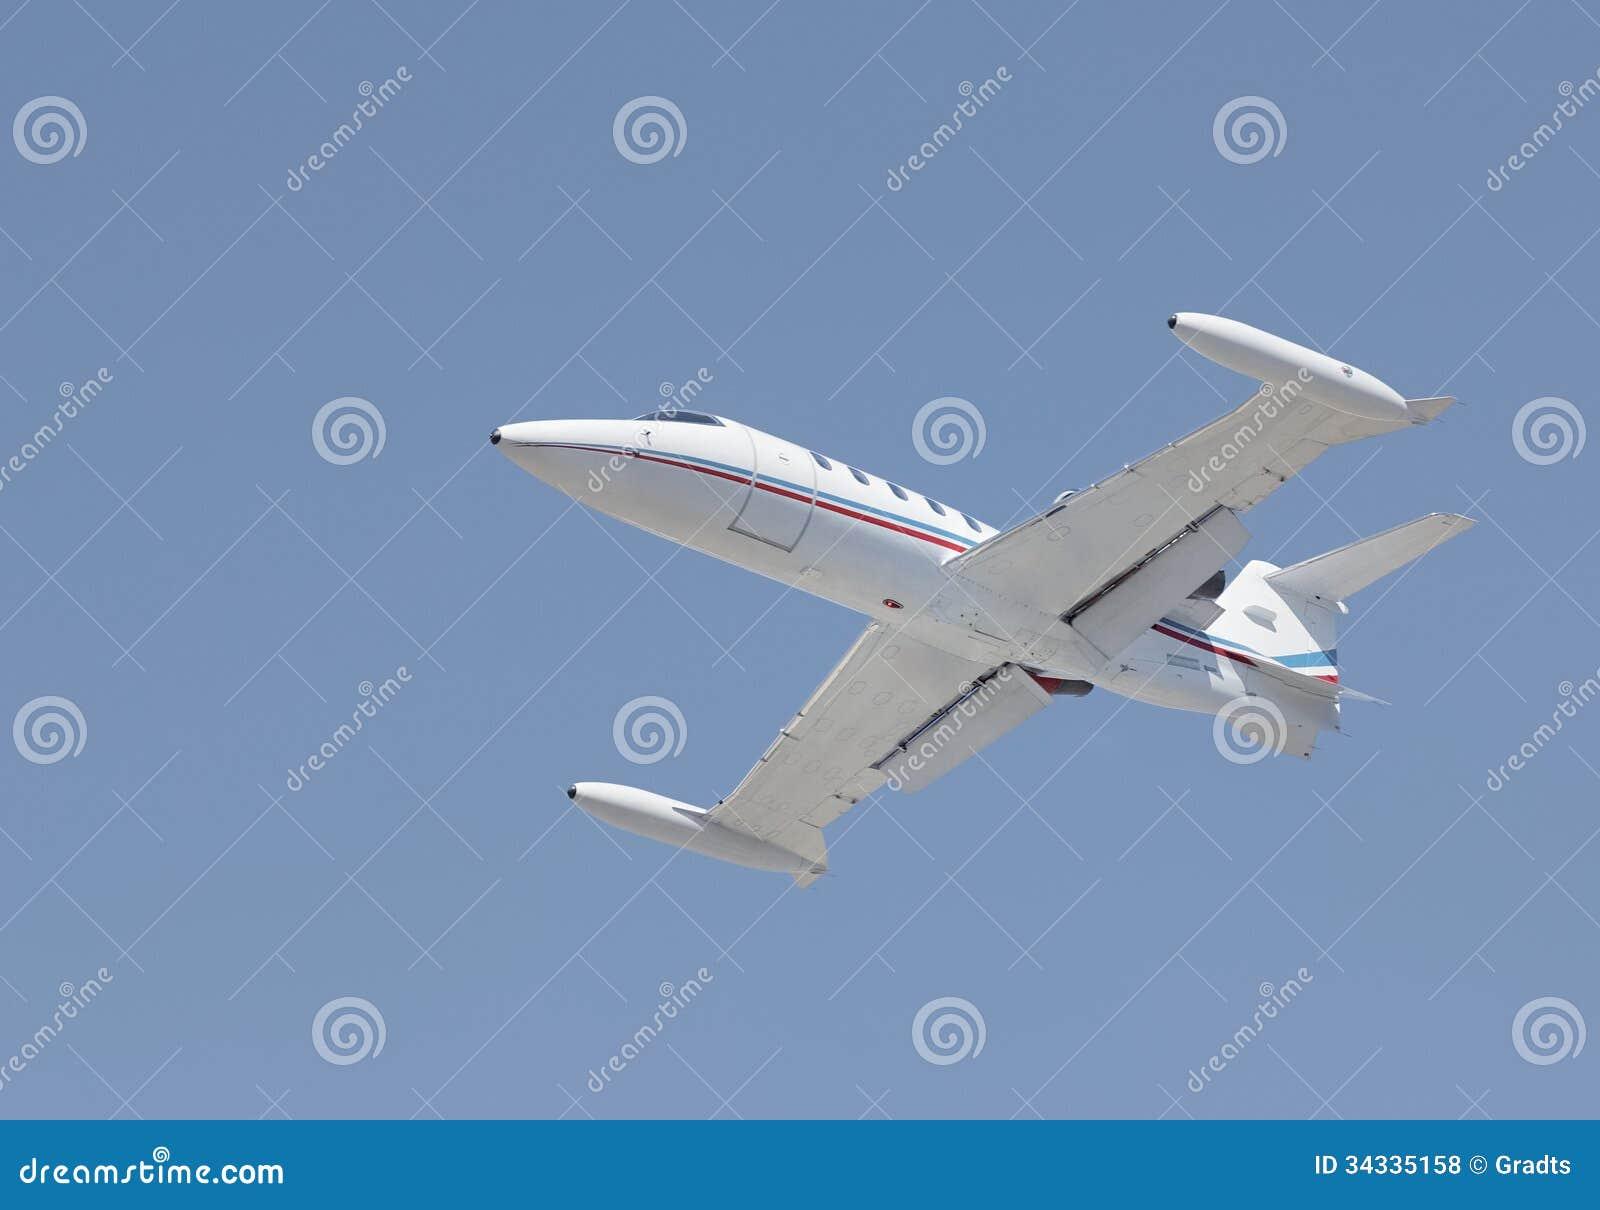 Jet Editorial Stock Photo  Image 34335158